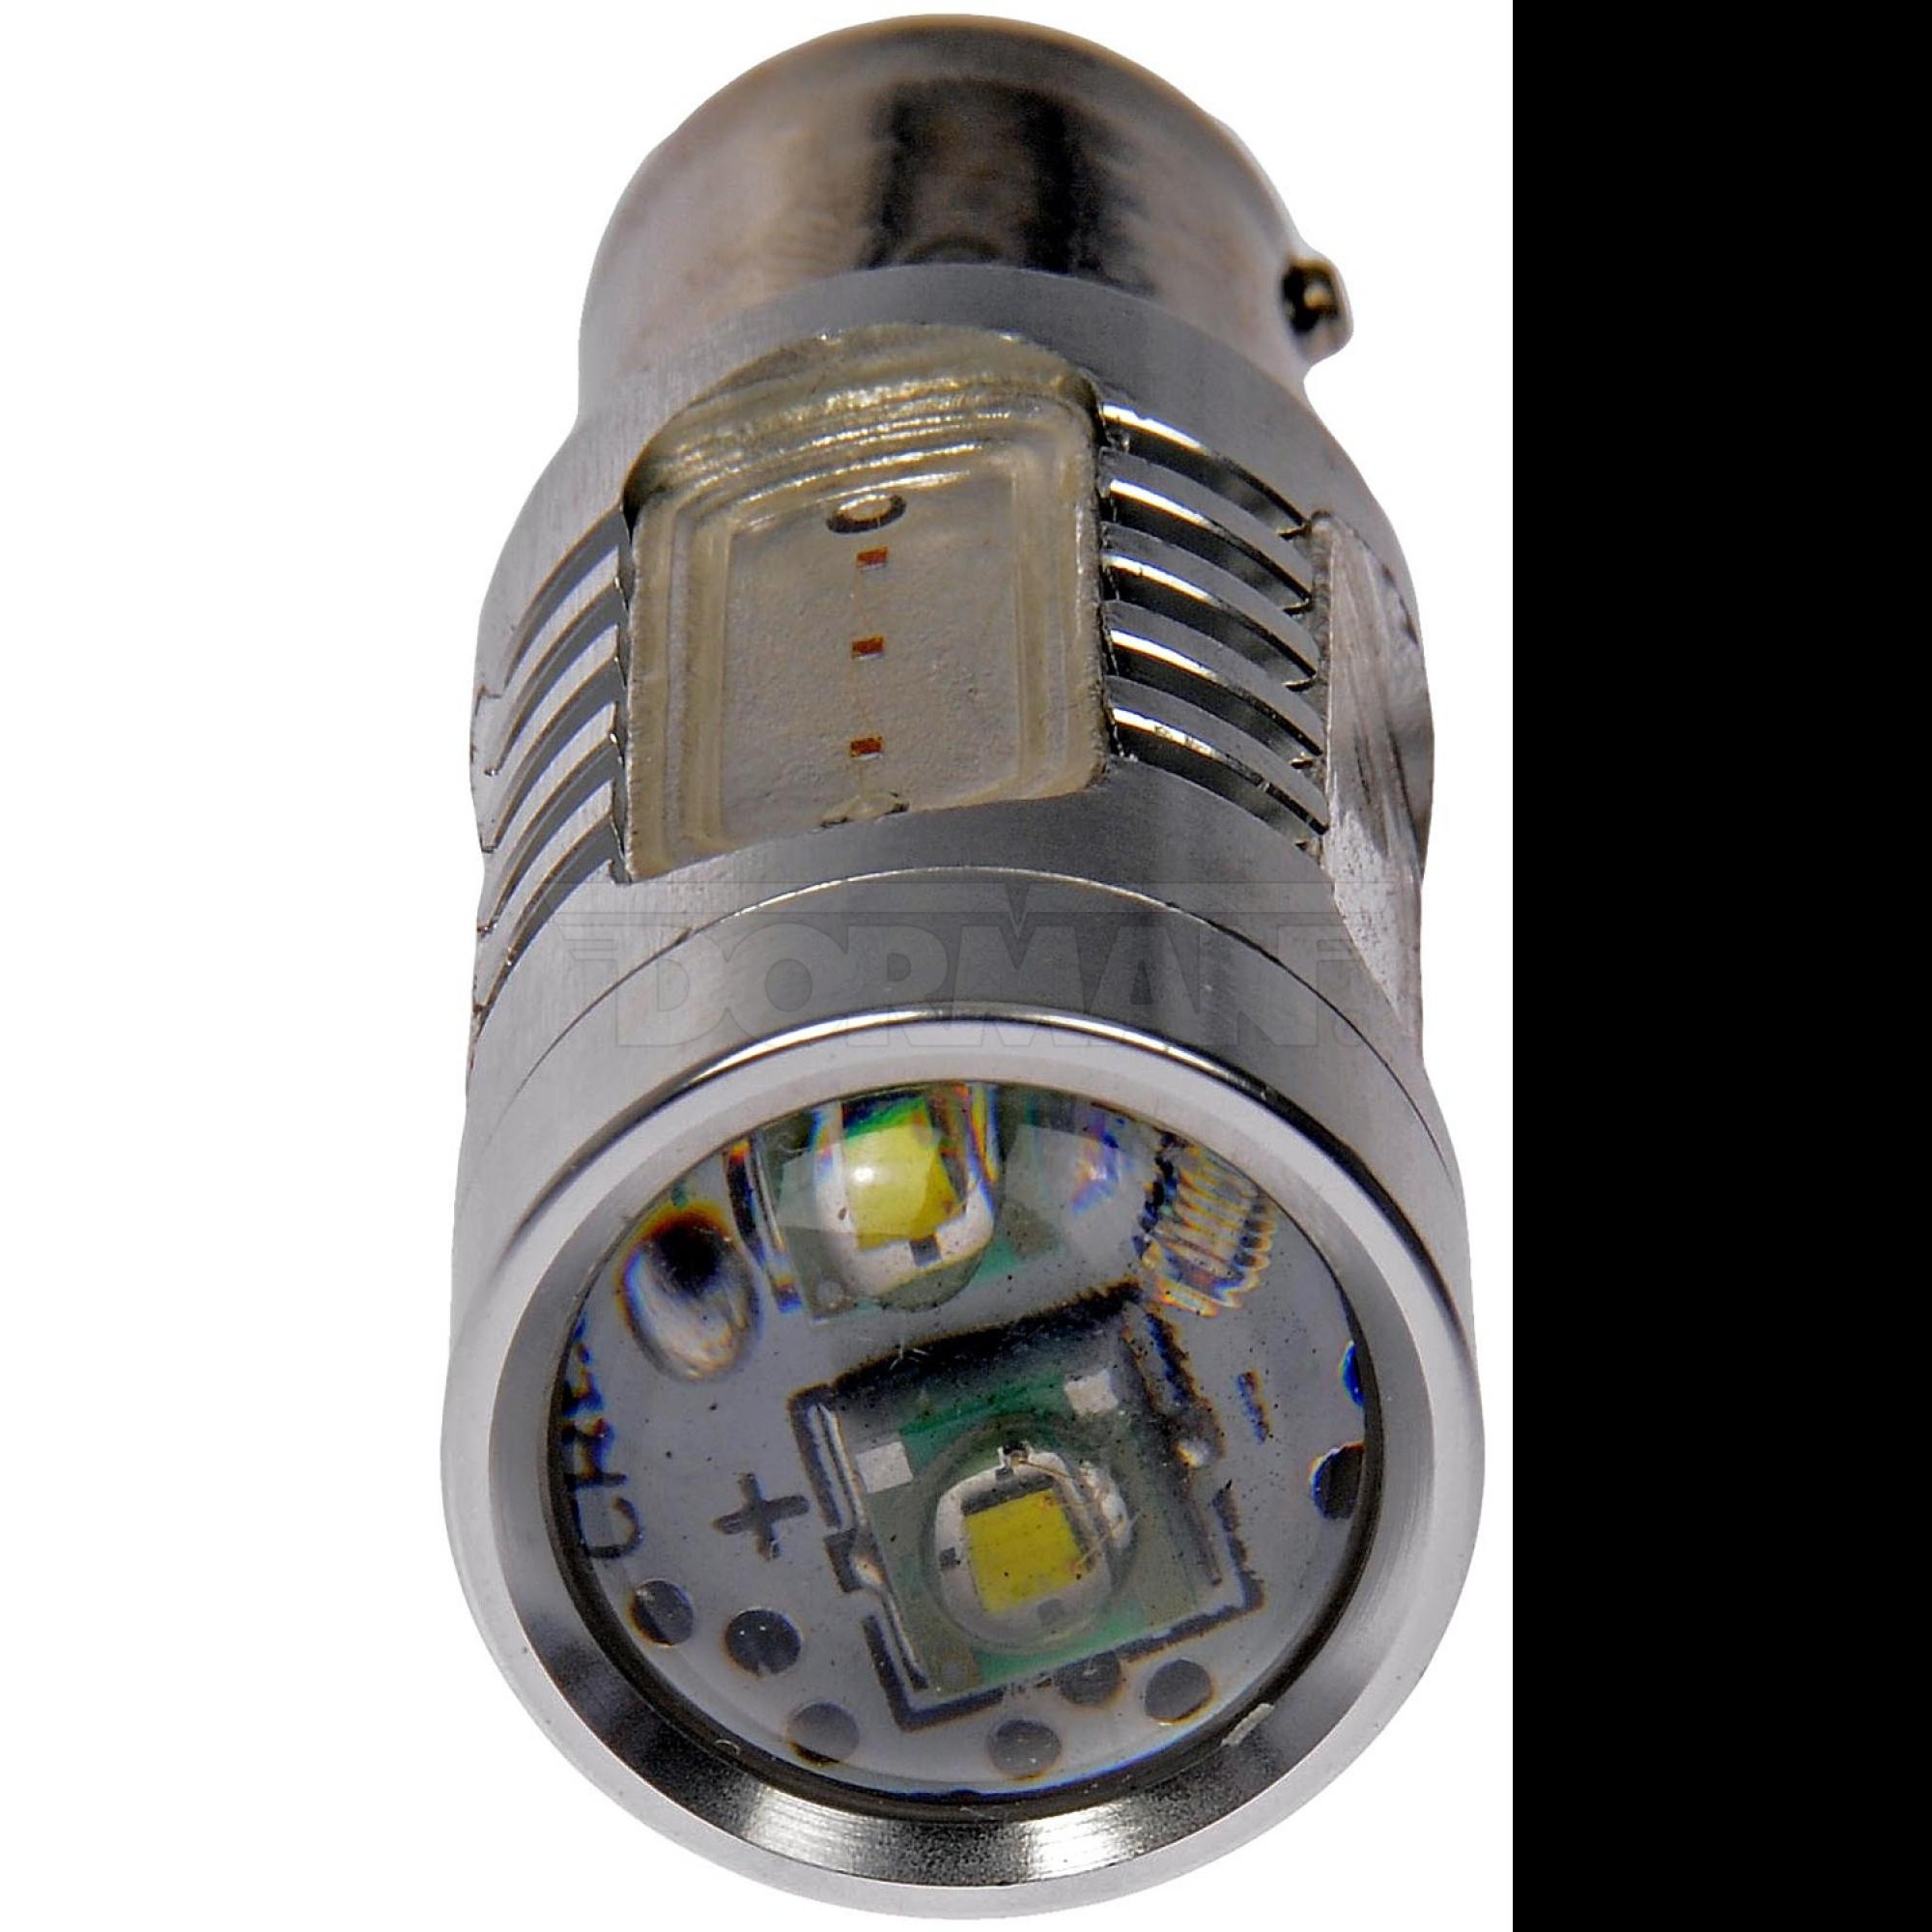 DORMAN 1157SWHP Parking Light Bulb